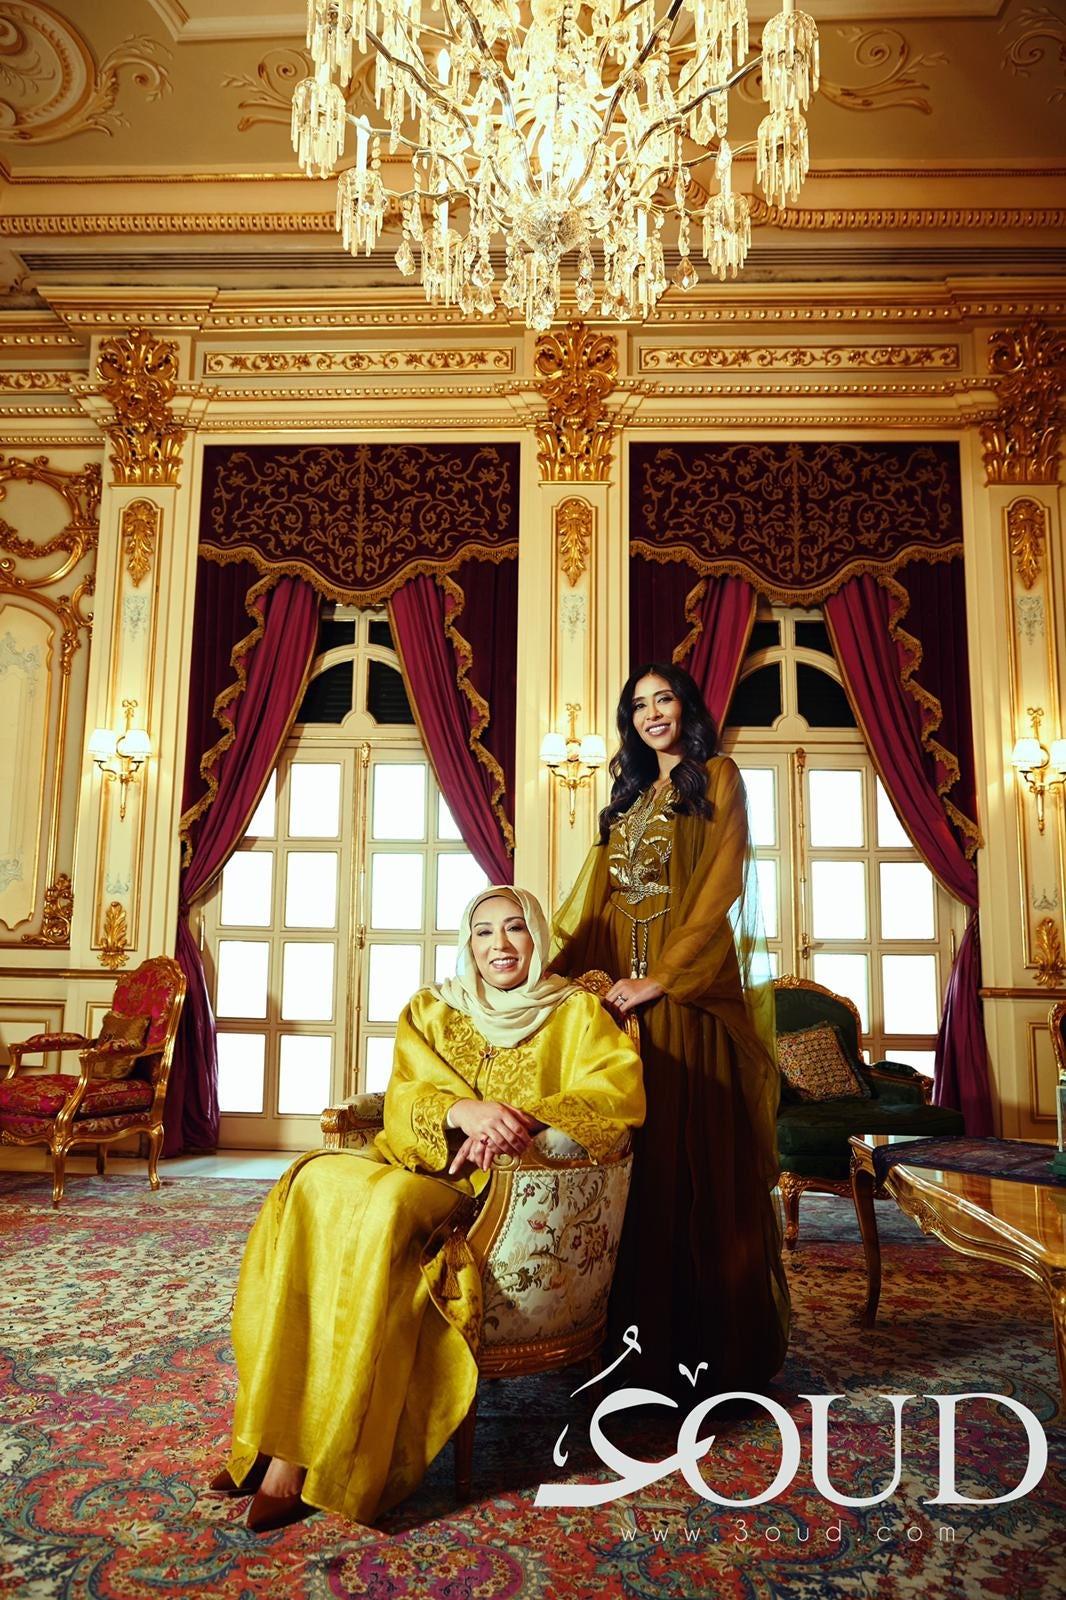 Sheikha Fadia Saad Al-Abdullah Al-Sabah and her daughter Sheikha Nabila Salman Al-Hamoud Al-Sabah pose for a recent 3oud photo shoot. 3oud.